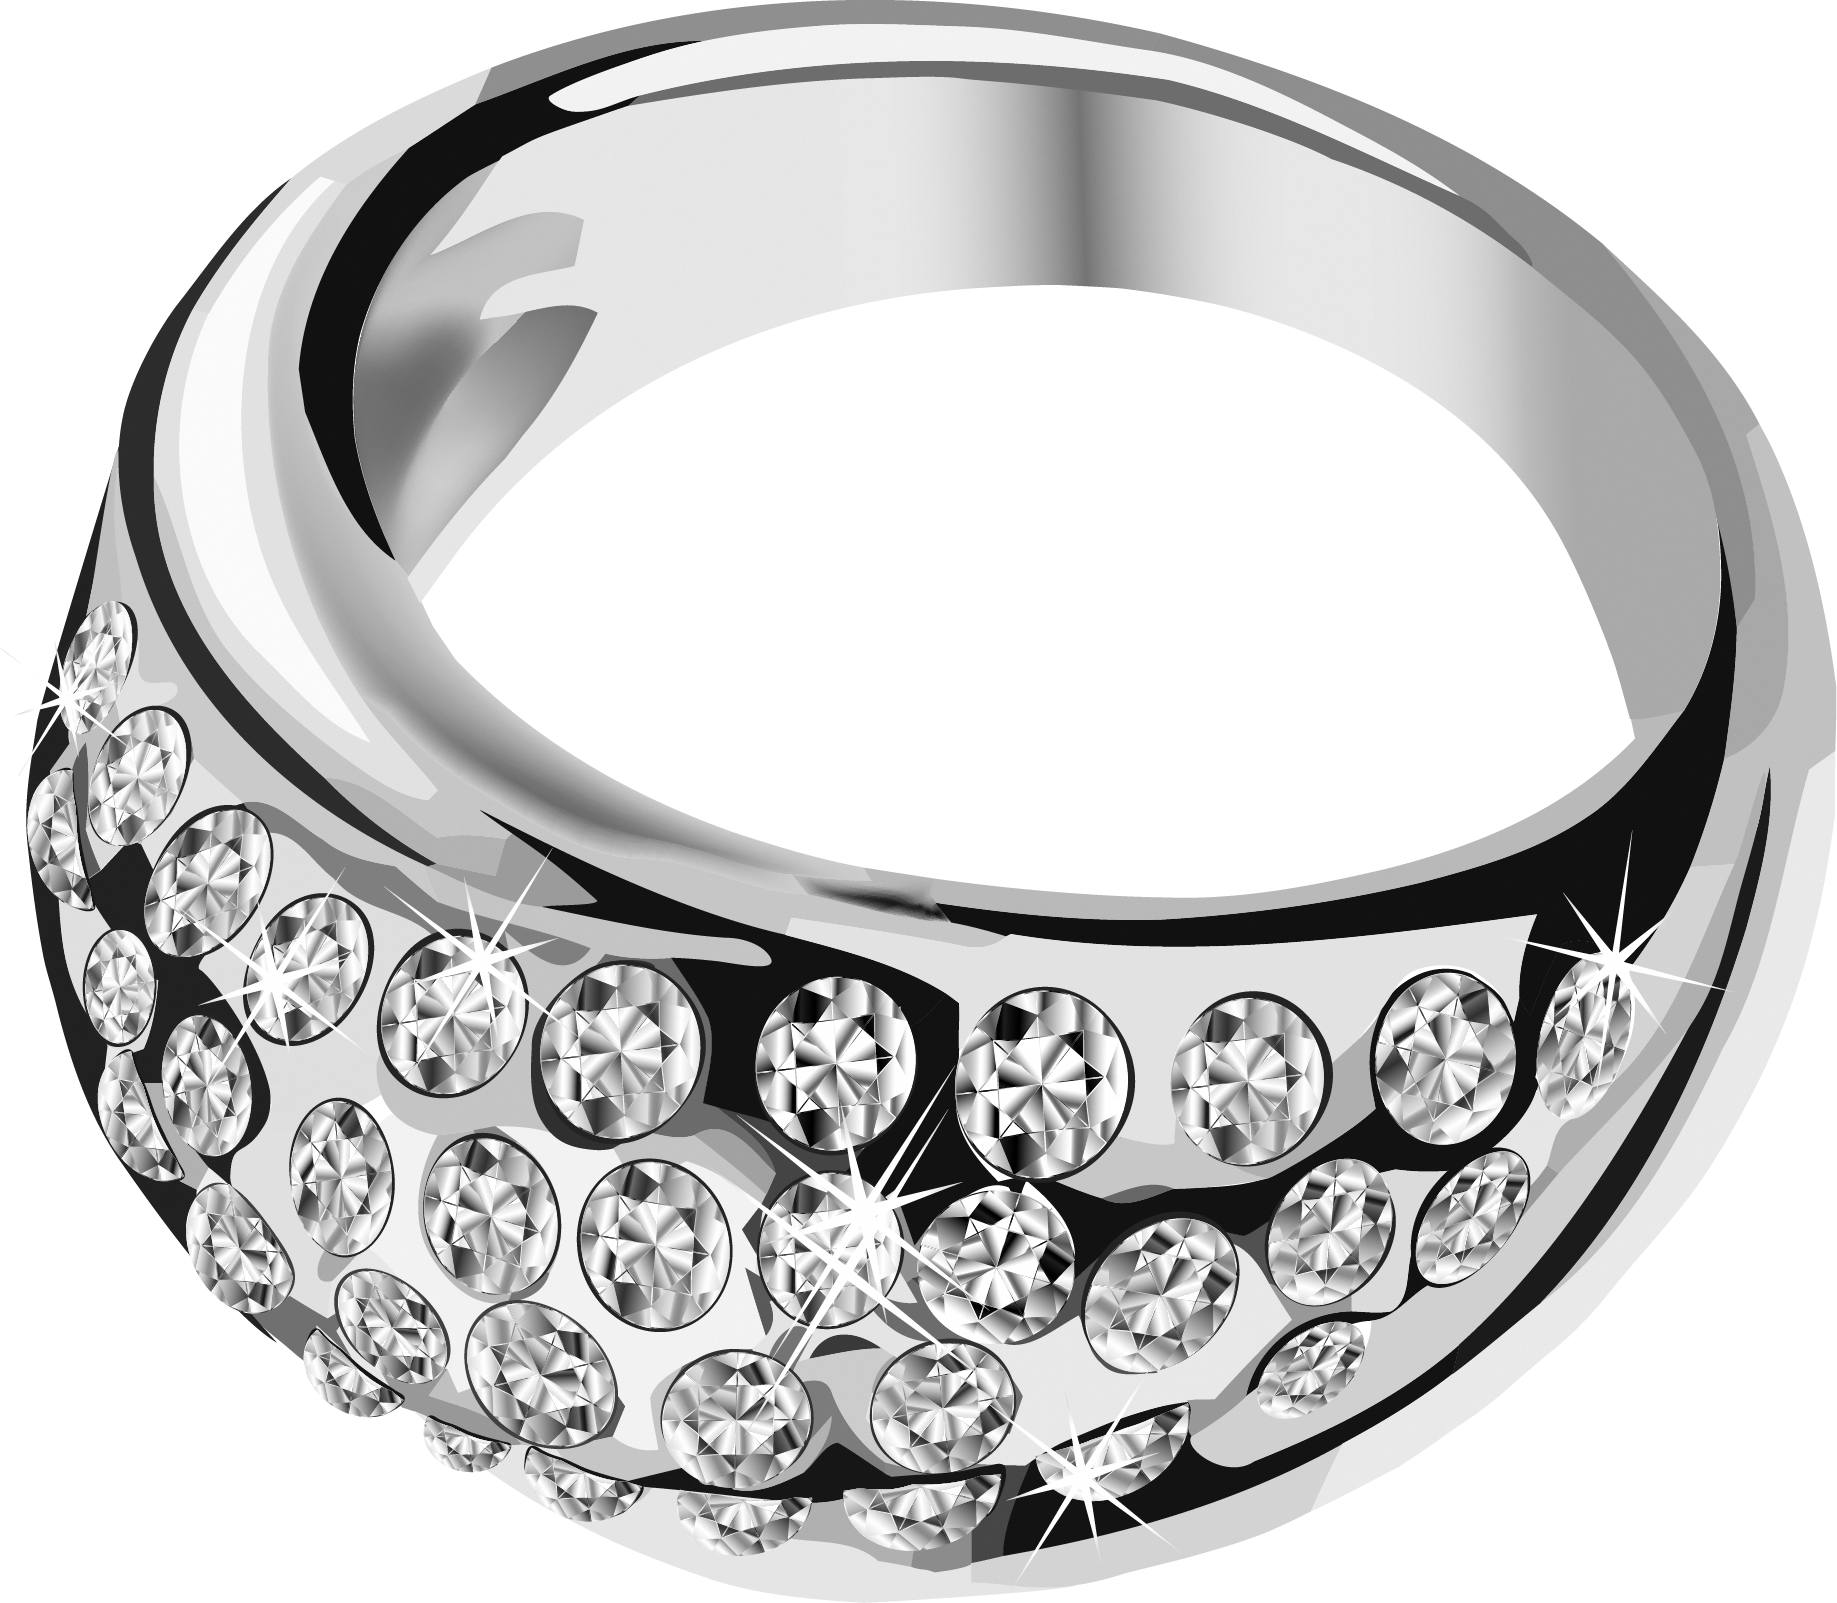 Silver Ring Repair Near Me Silvernecklaceinfinity 925silverbraceletvalue